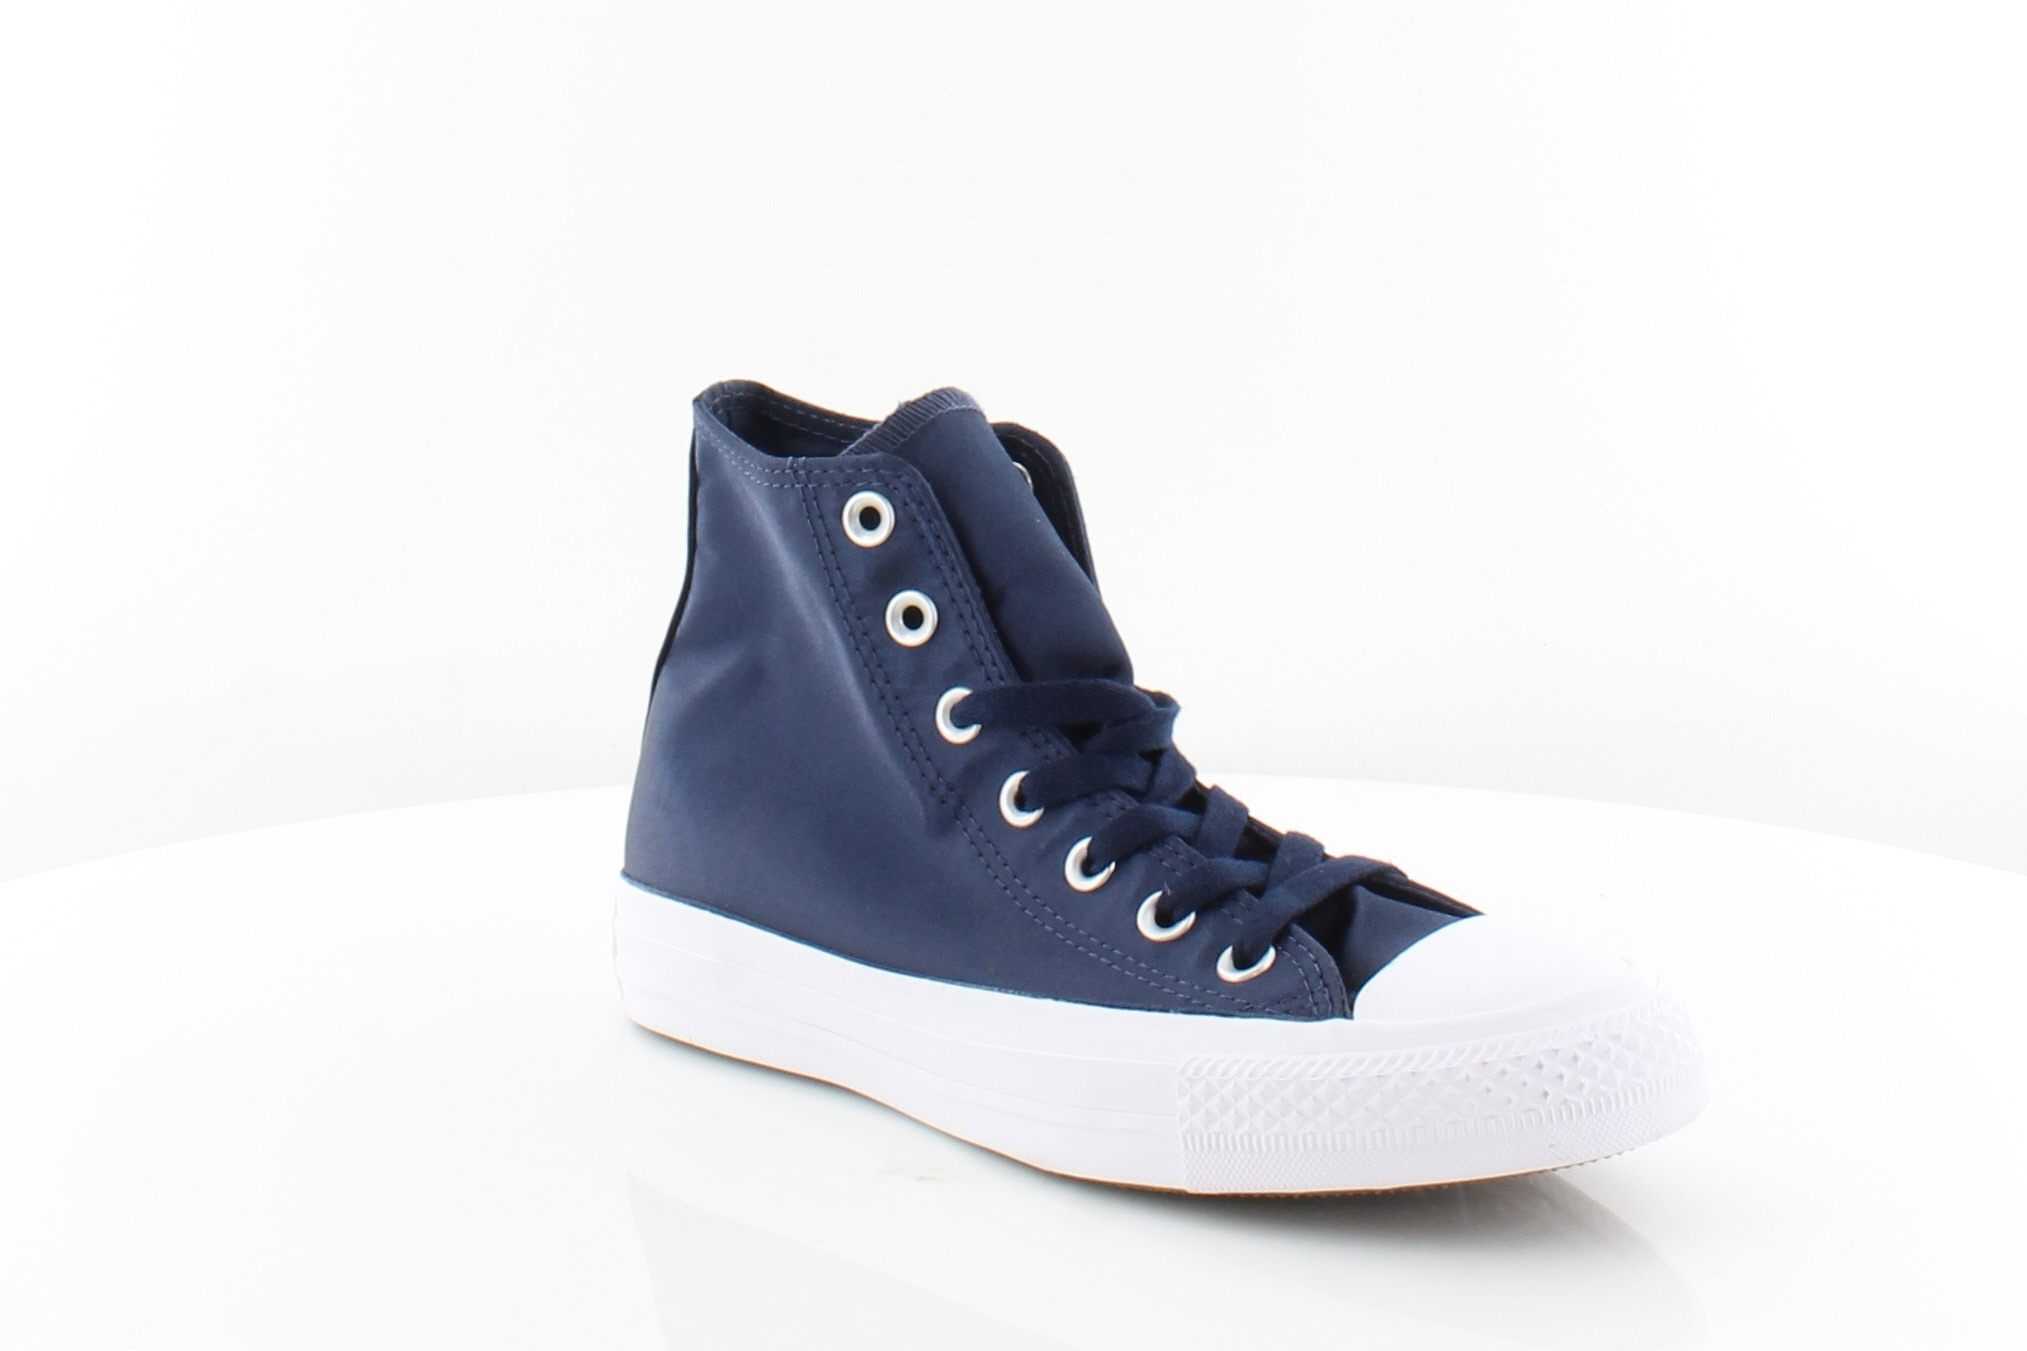 7eff041fd Converse Ctas Hi Women's Fashion Sneakers Midnight Navy/ Midnight Navy